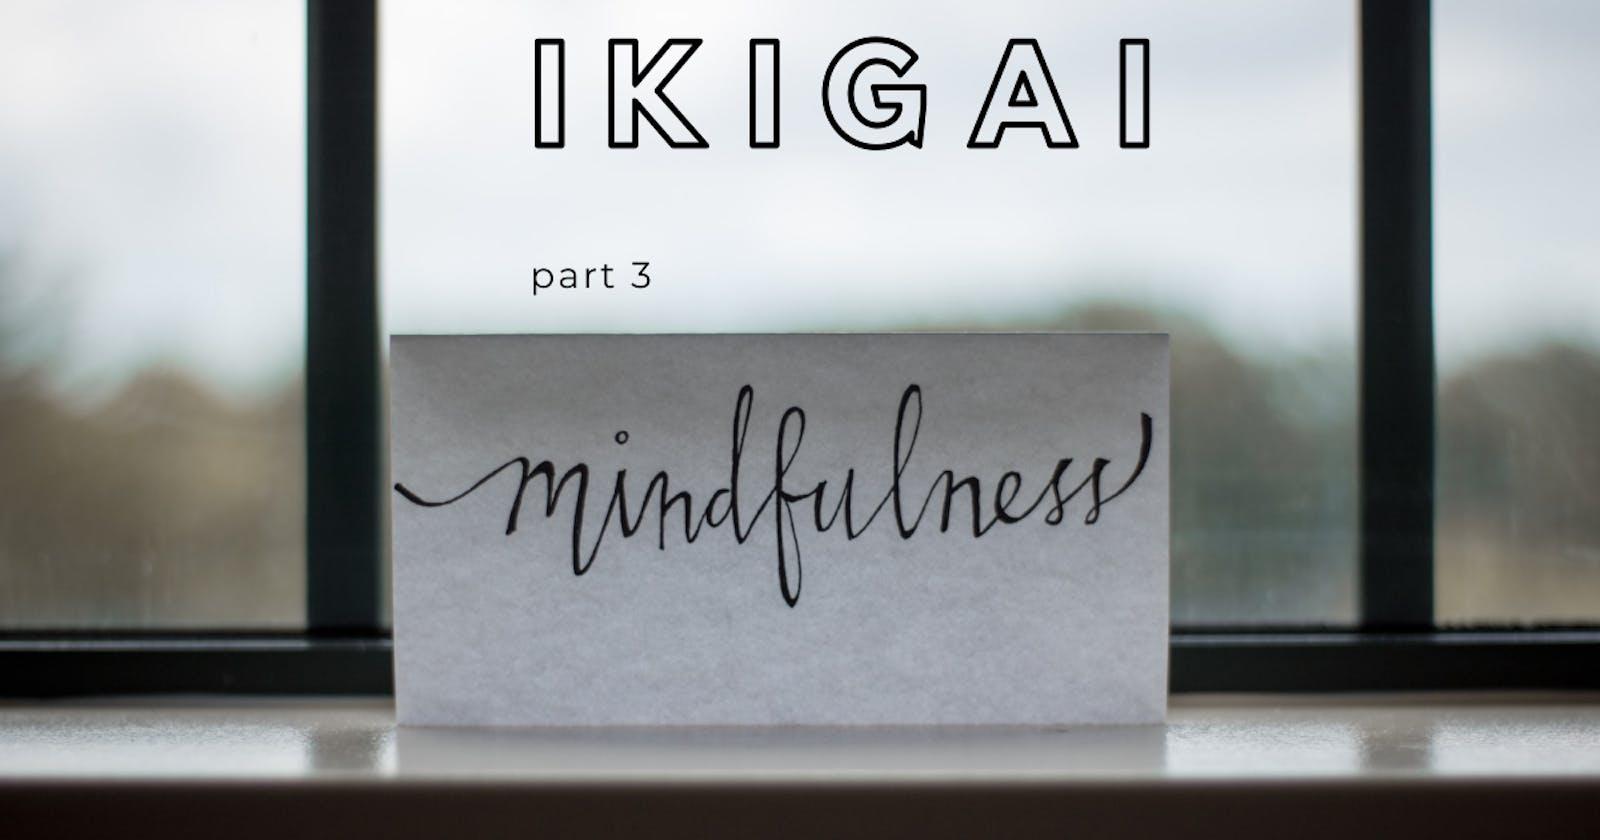 IKIGAI - part 3